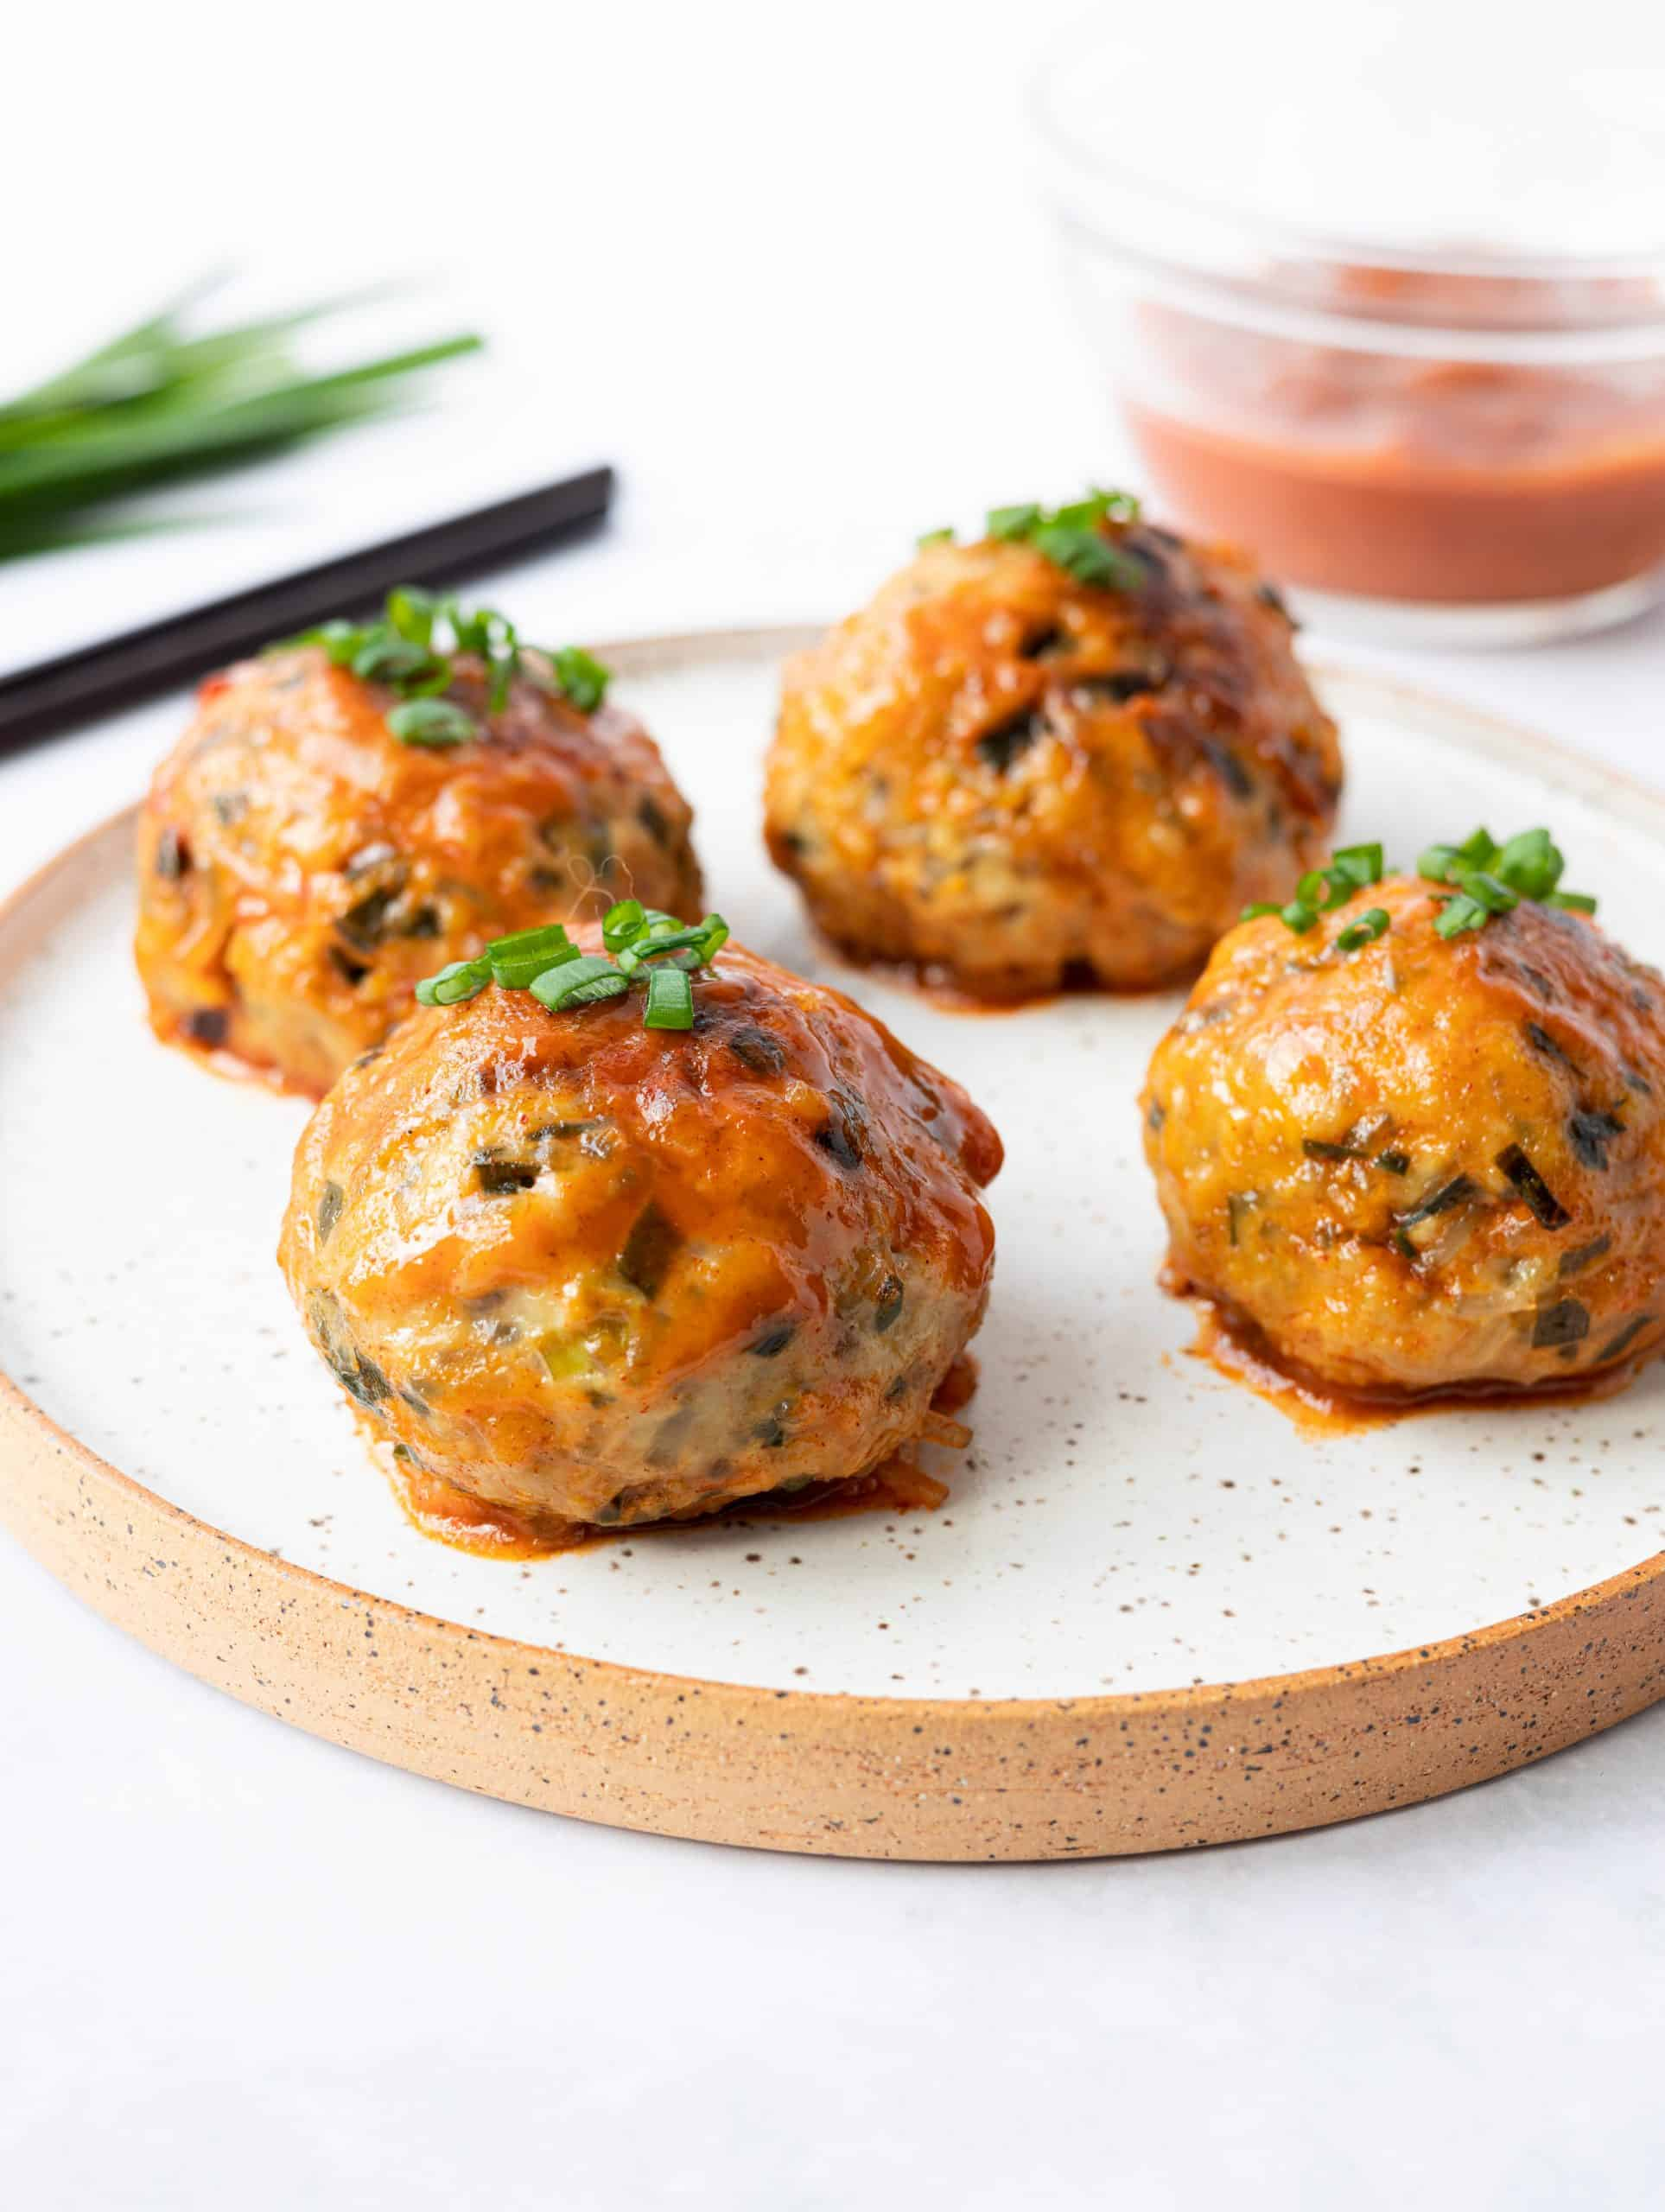 Gochujang Glazed Korean Meatballs